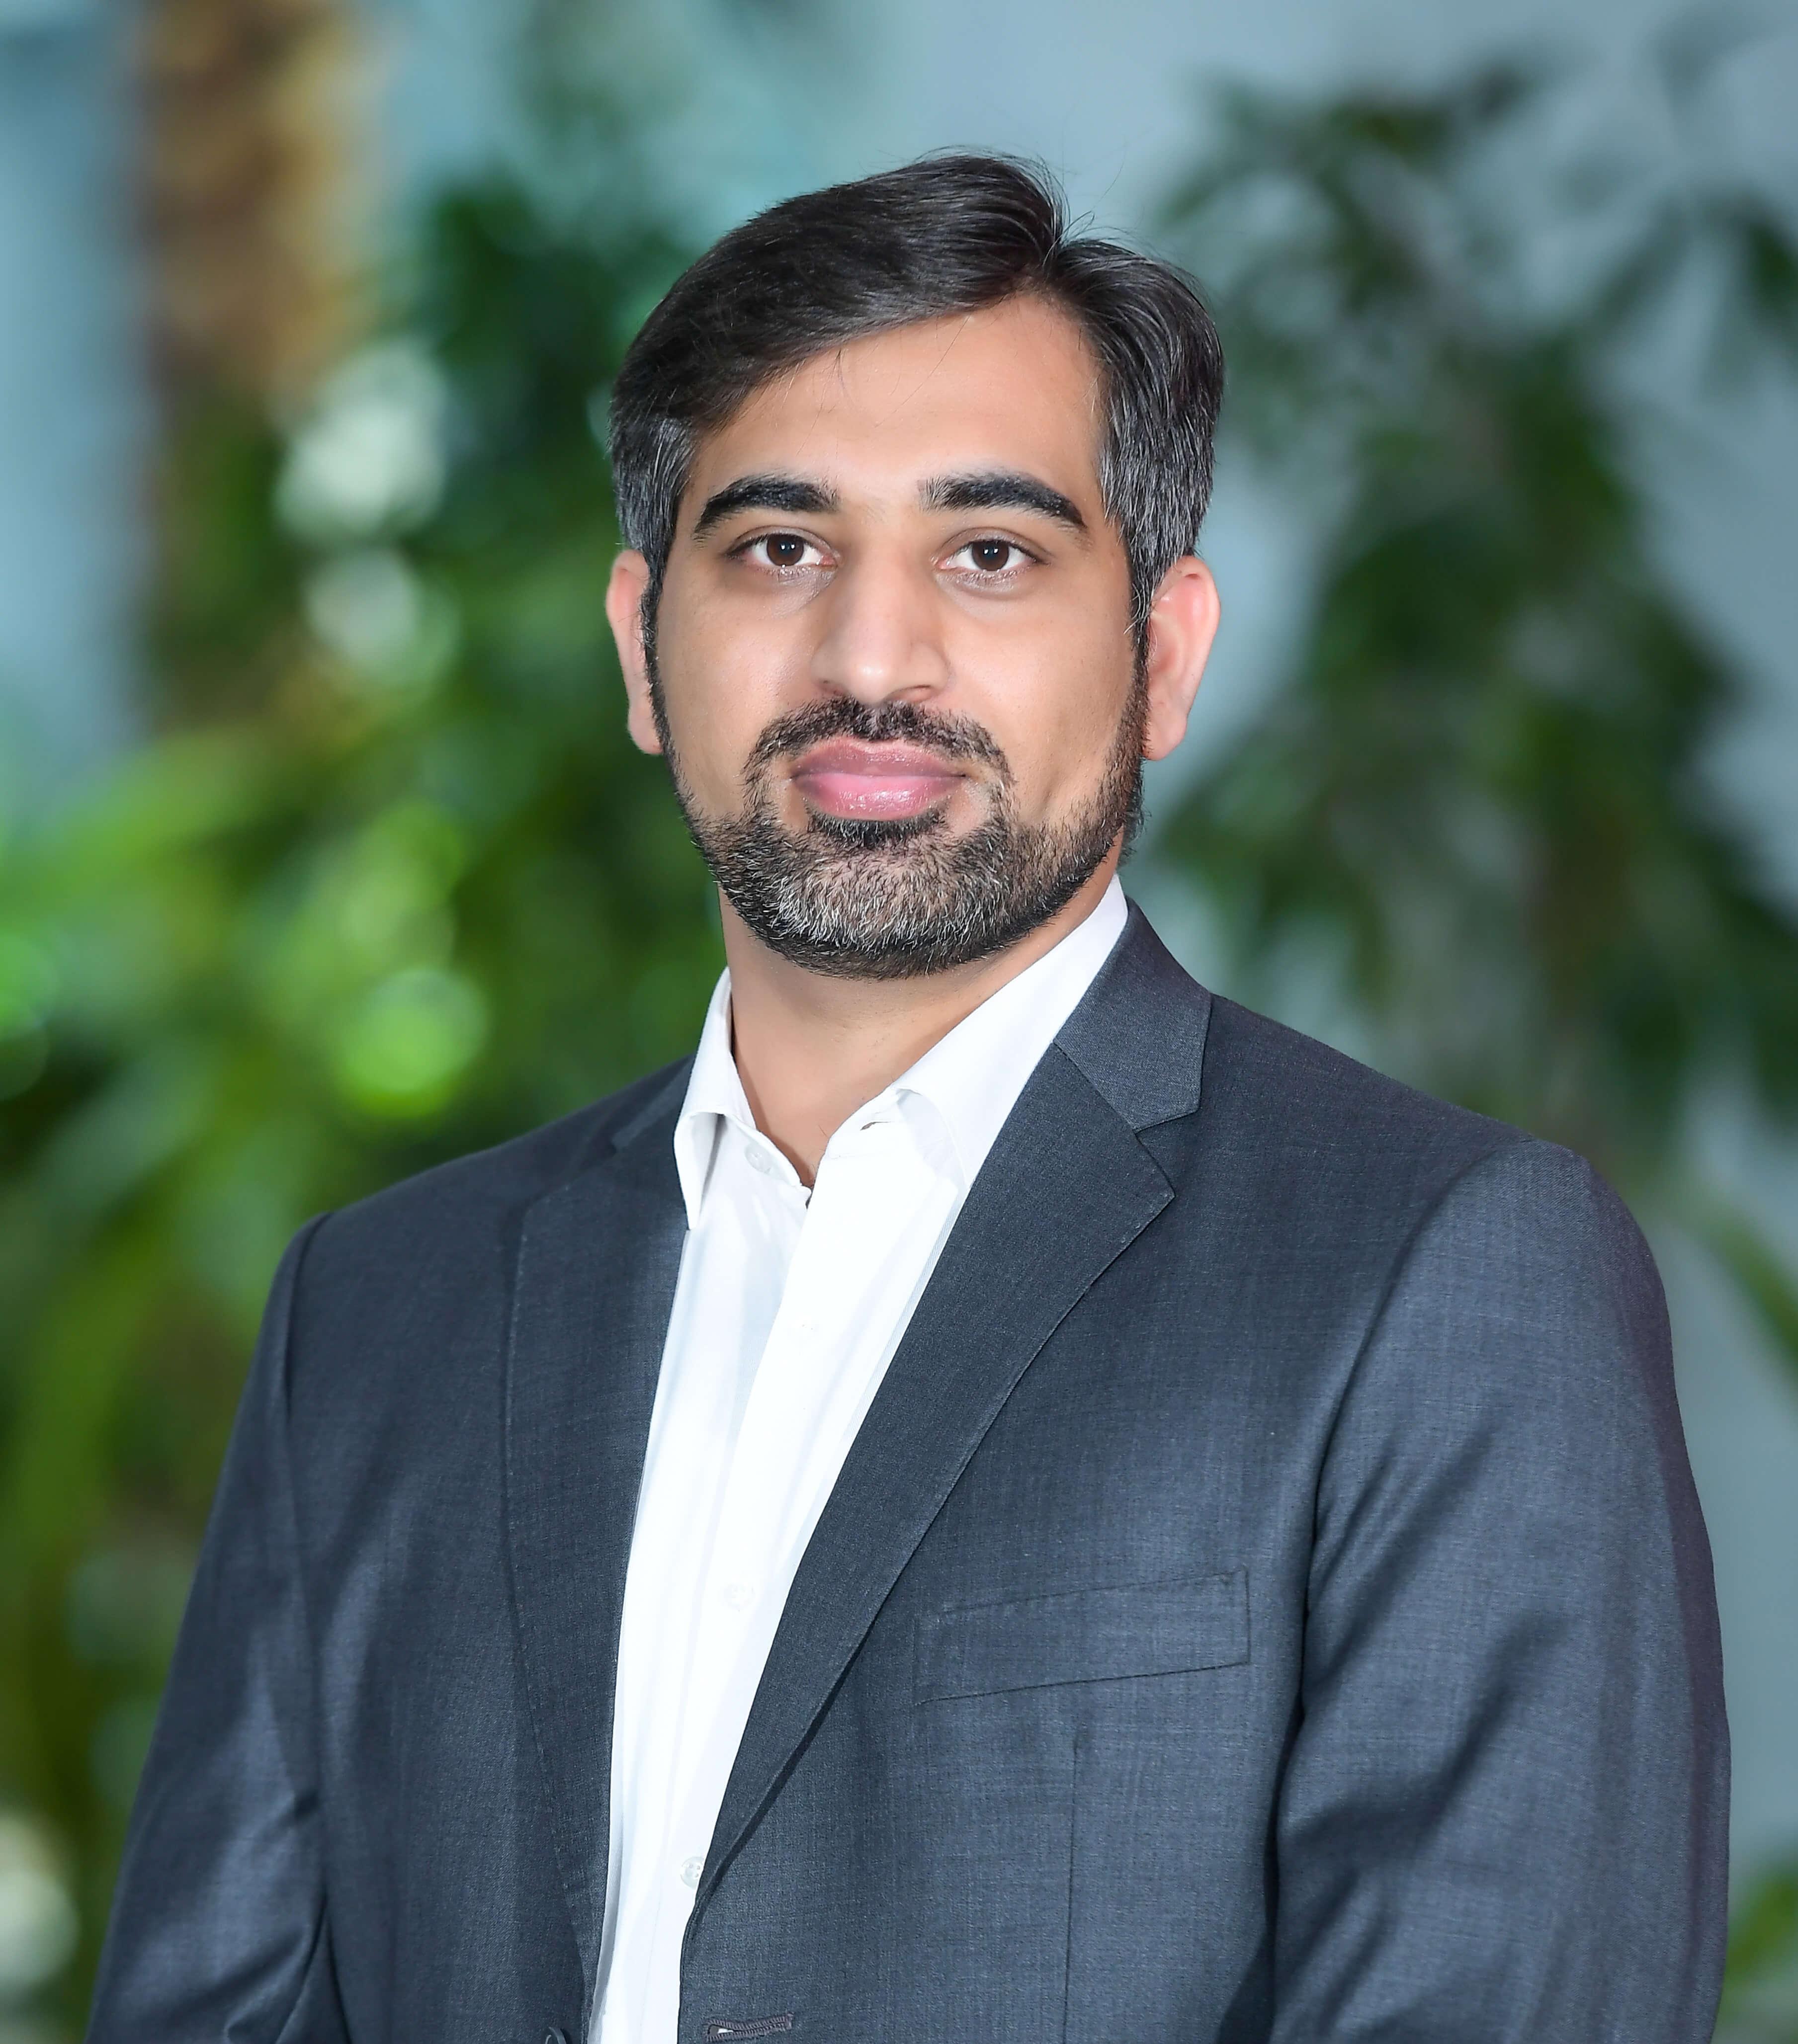 Dr. Shehzad Ahmed